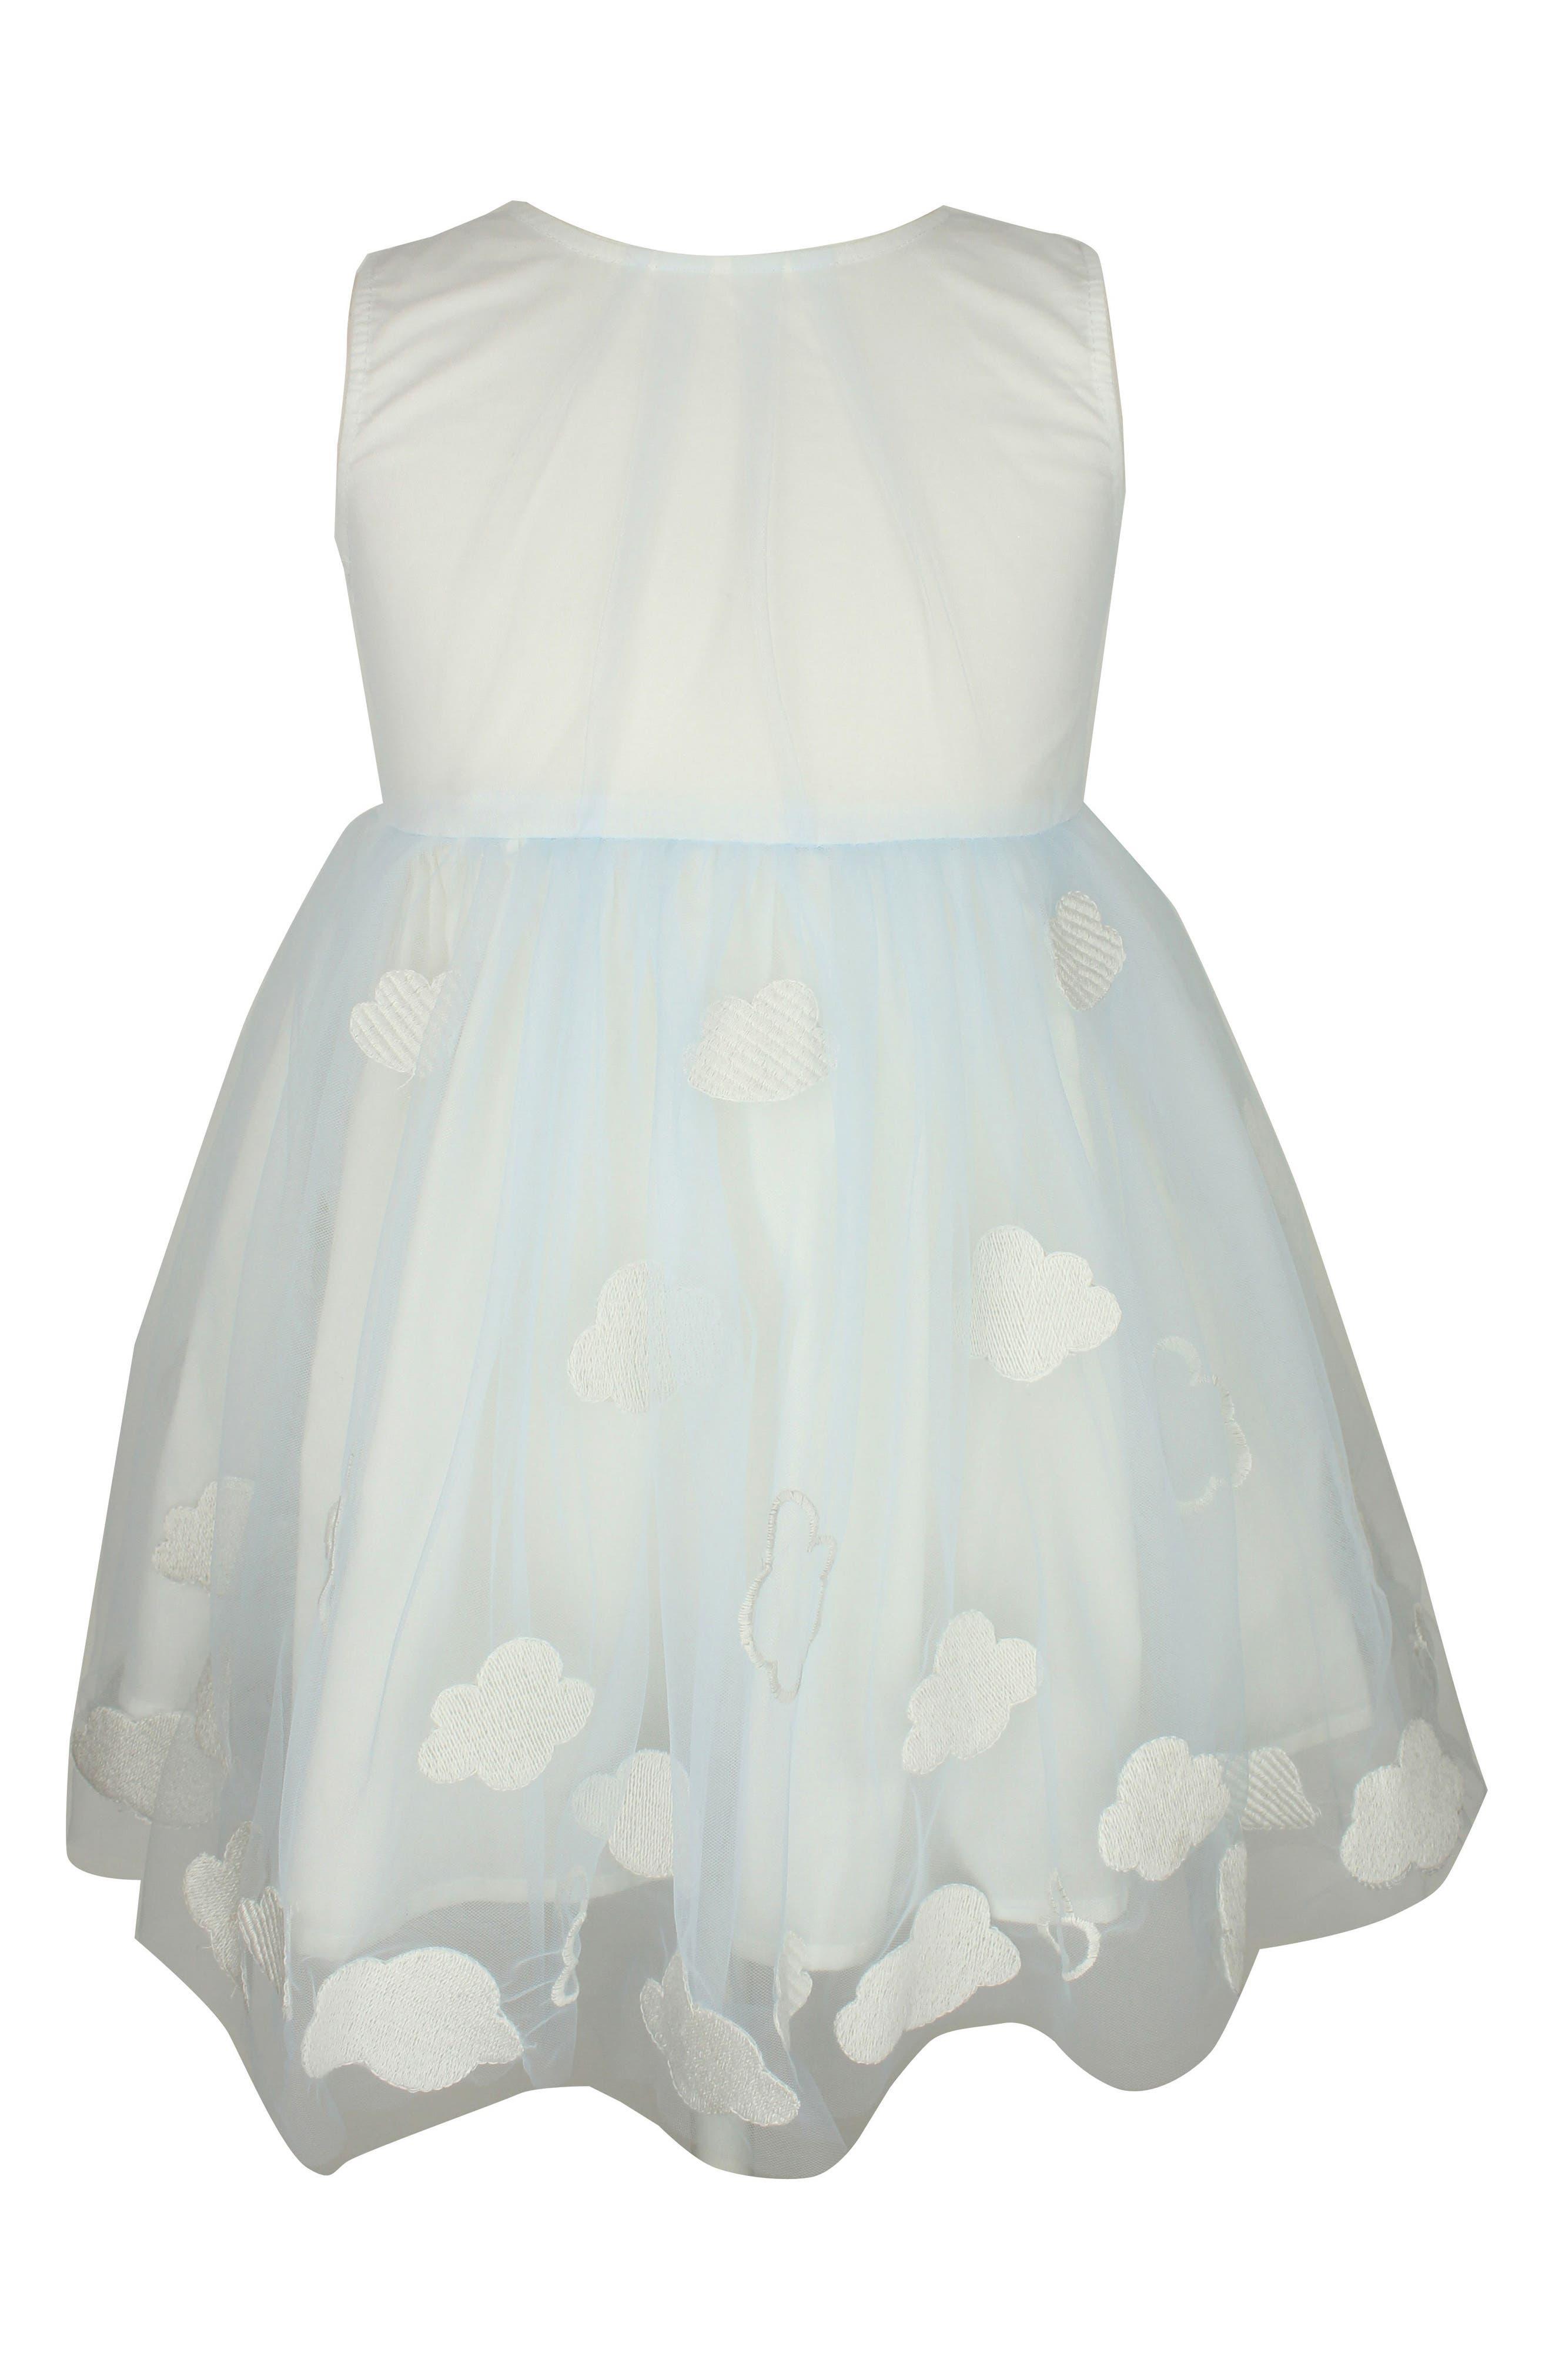 Main Image - Popatu Embroidered Cloud Dress (Toddler Girls, Little Girls & Big Girls)